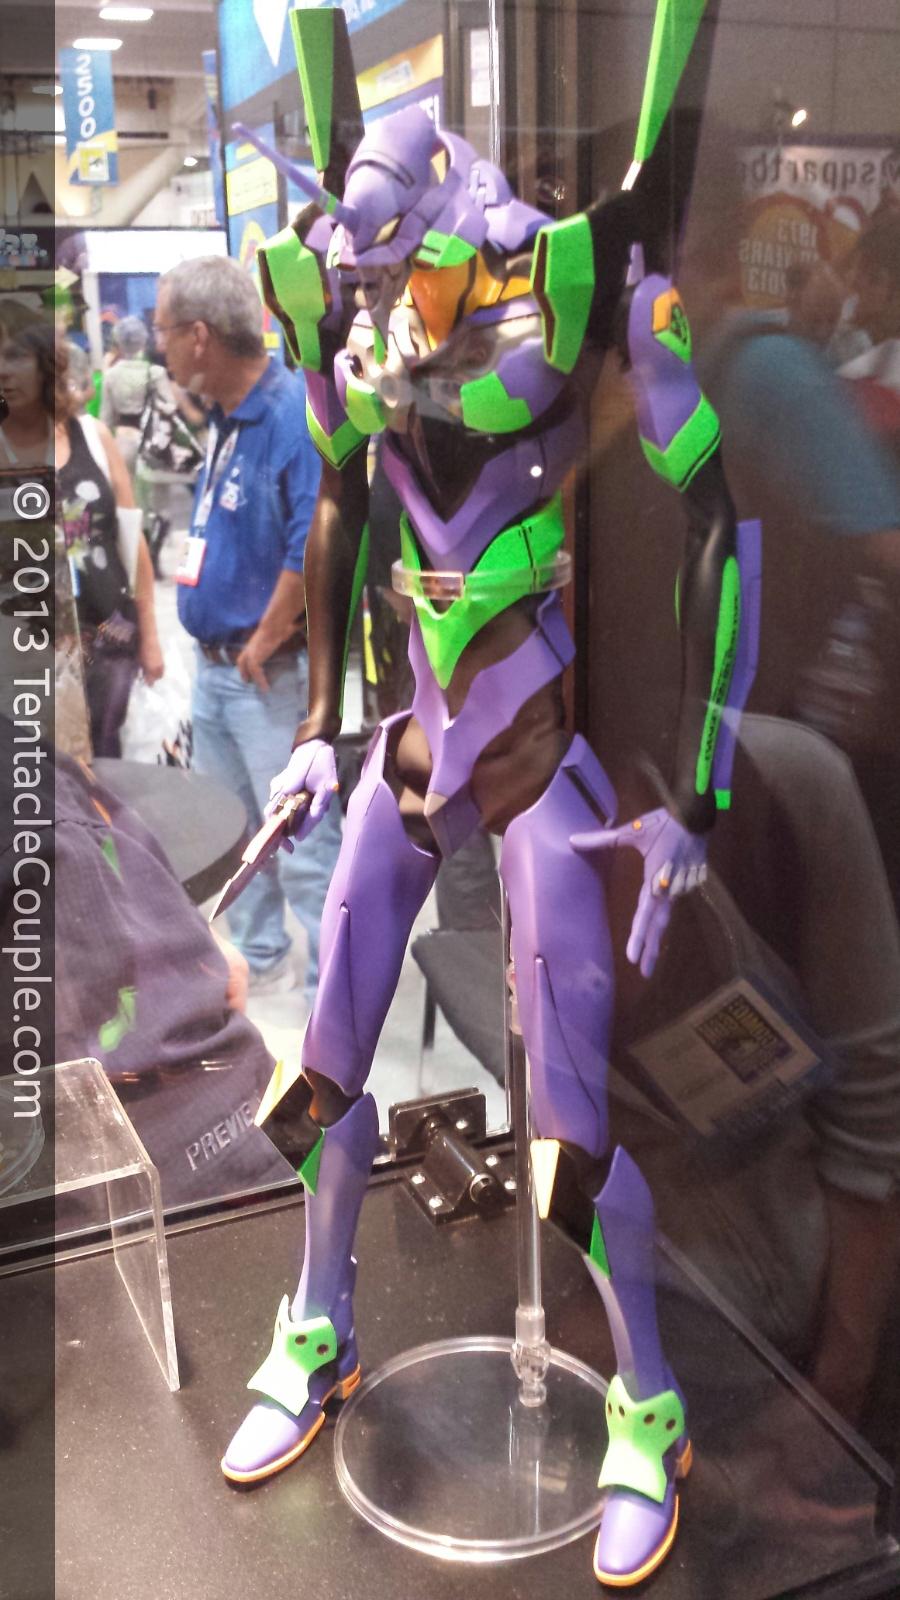 San Diego Comic-Con 2013 - Evangelion Unit 01